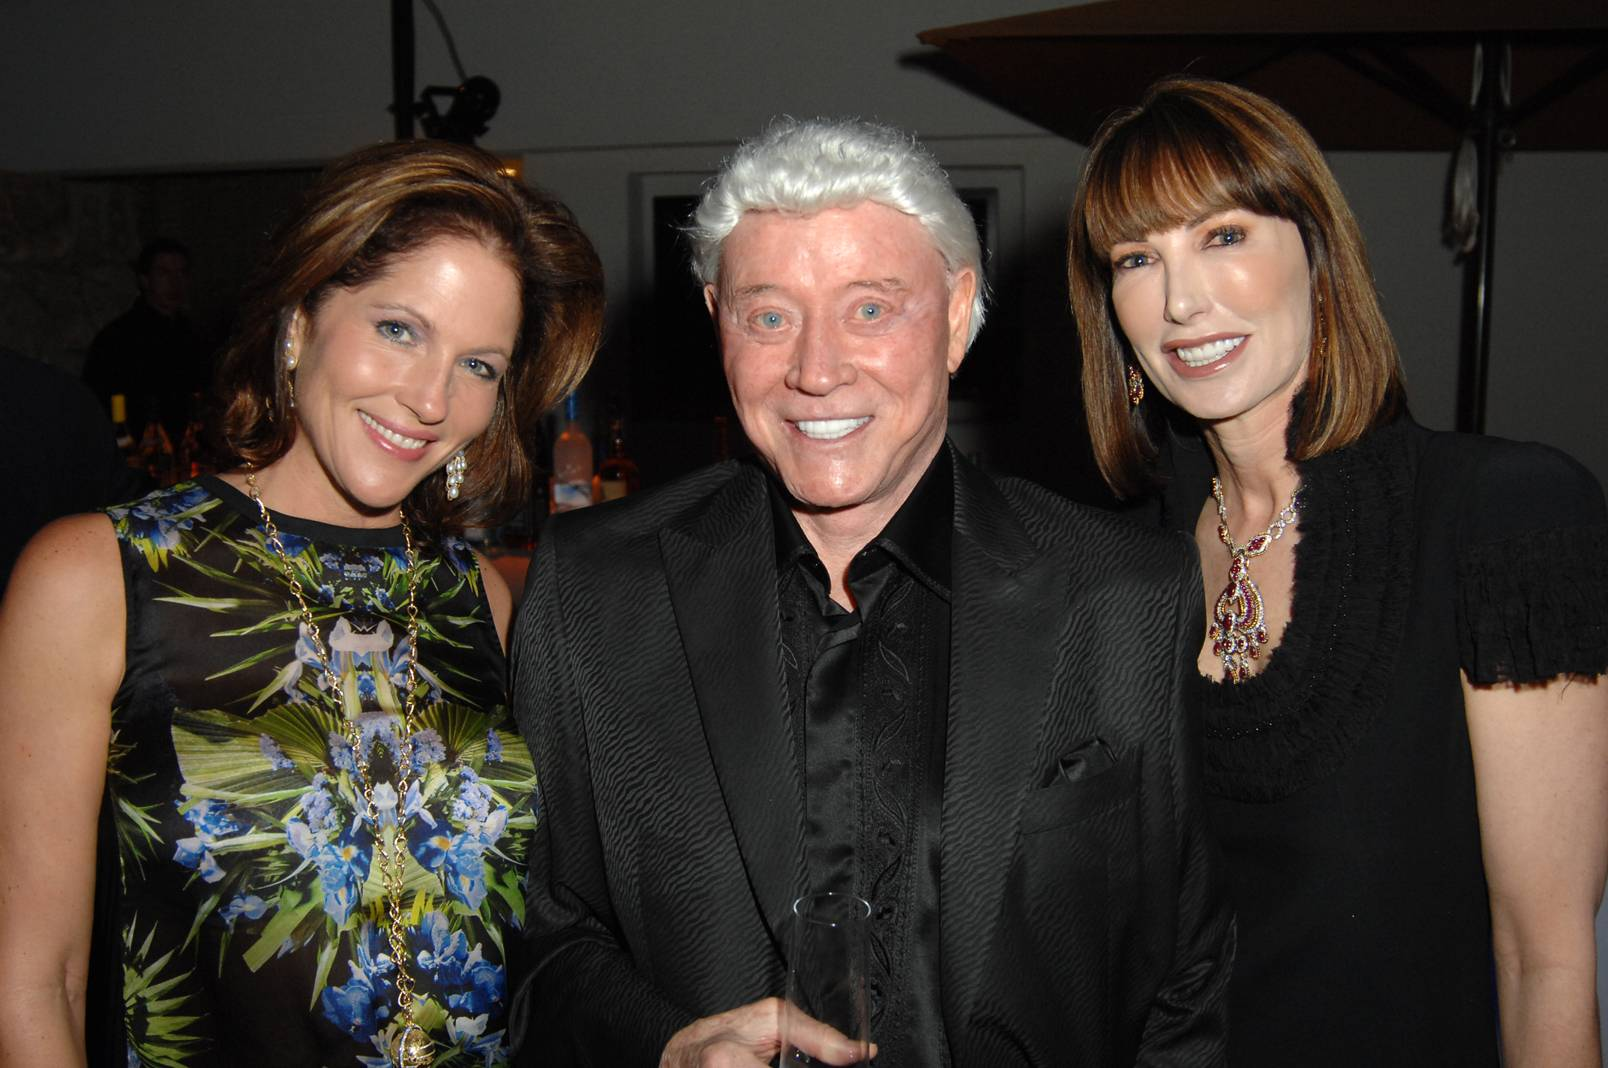 Karen Pulaski, Harry and Valerie Cooper